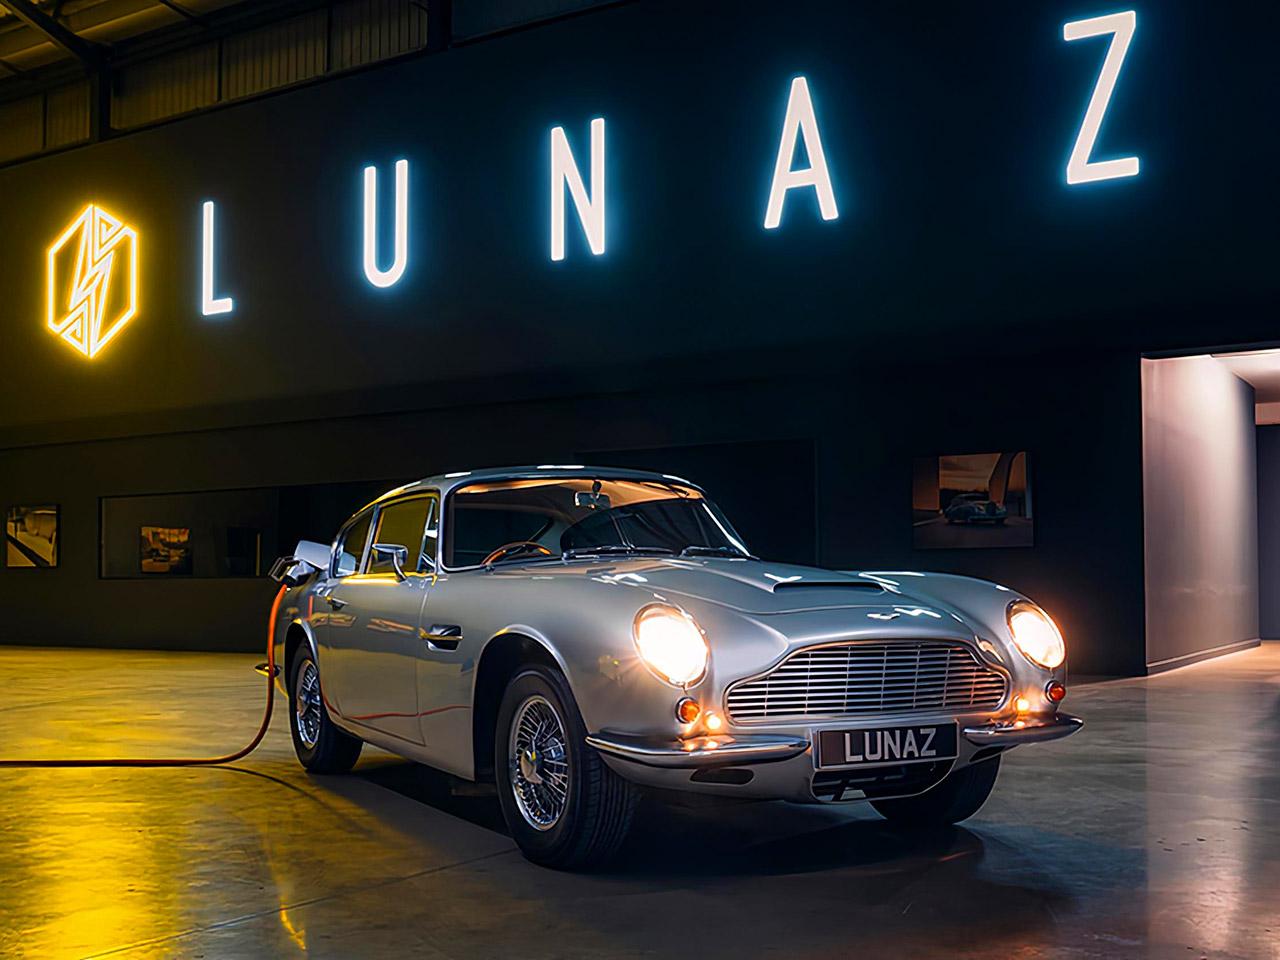 Lunaz Electric Aston Martin DB6 James Bond No Time to Die